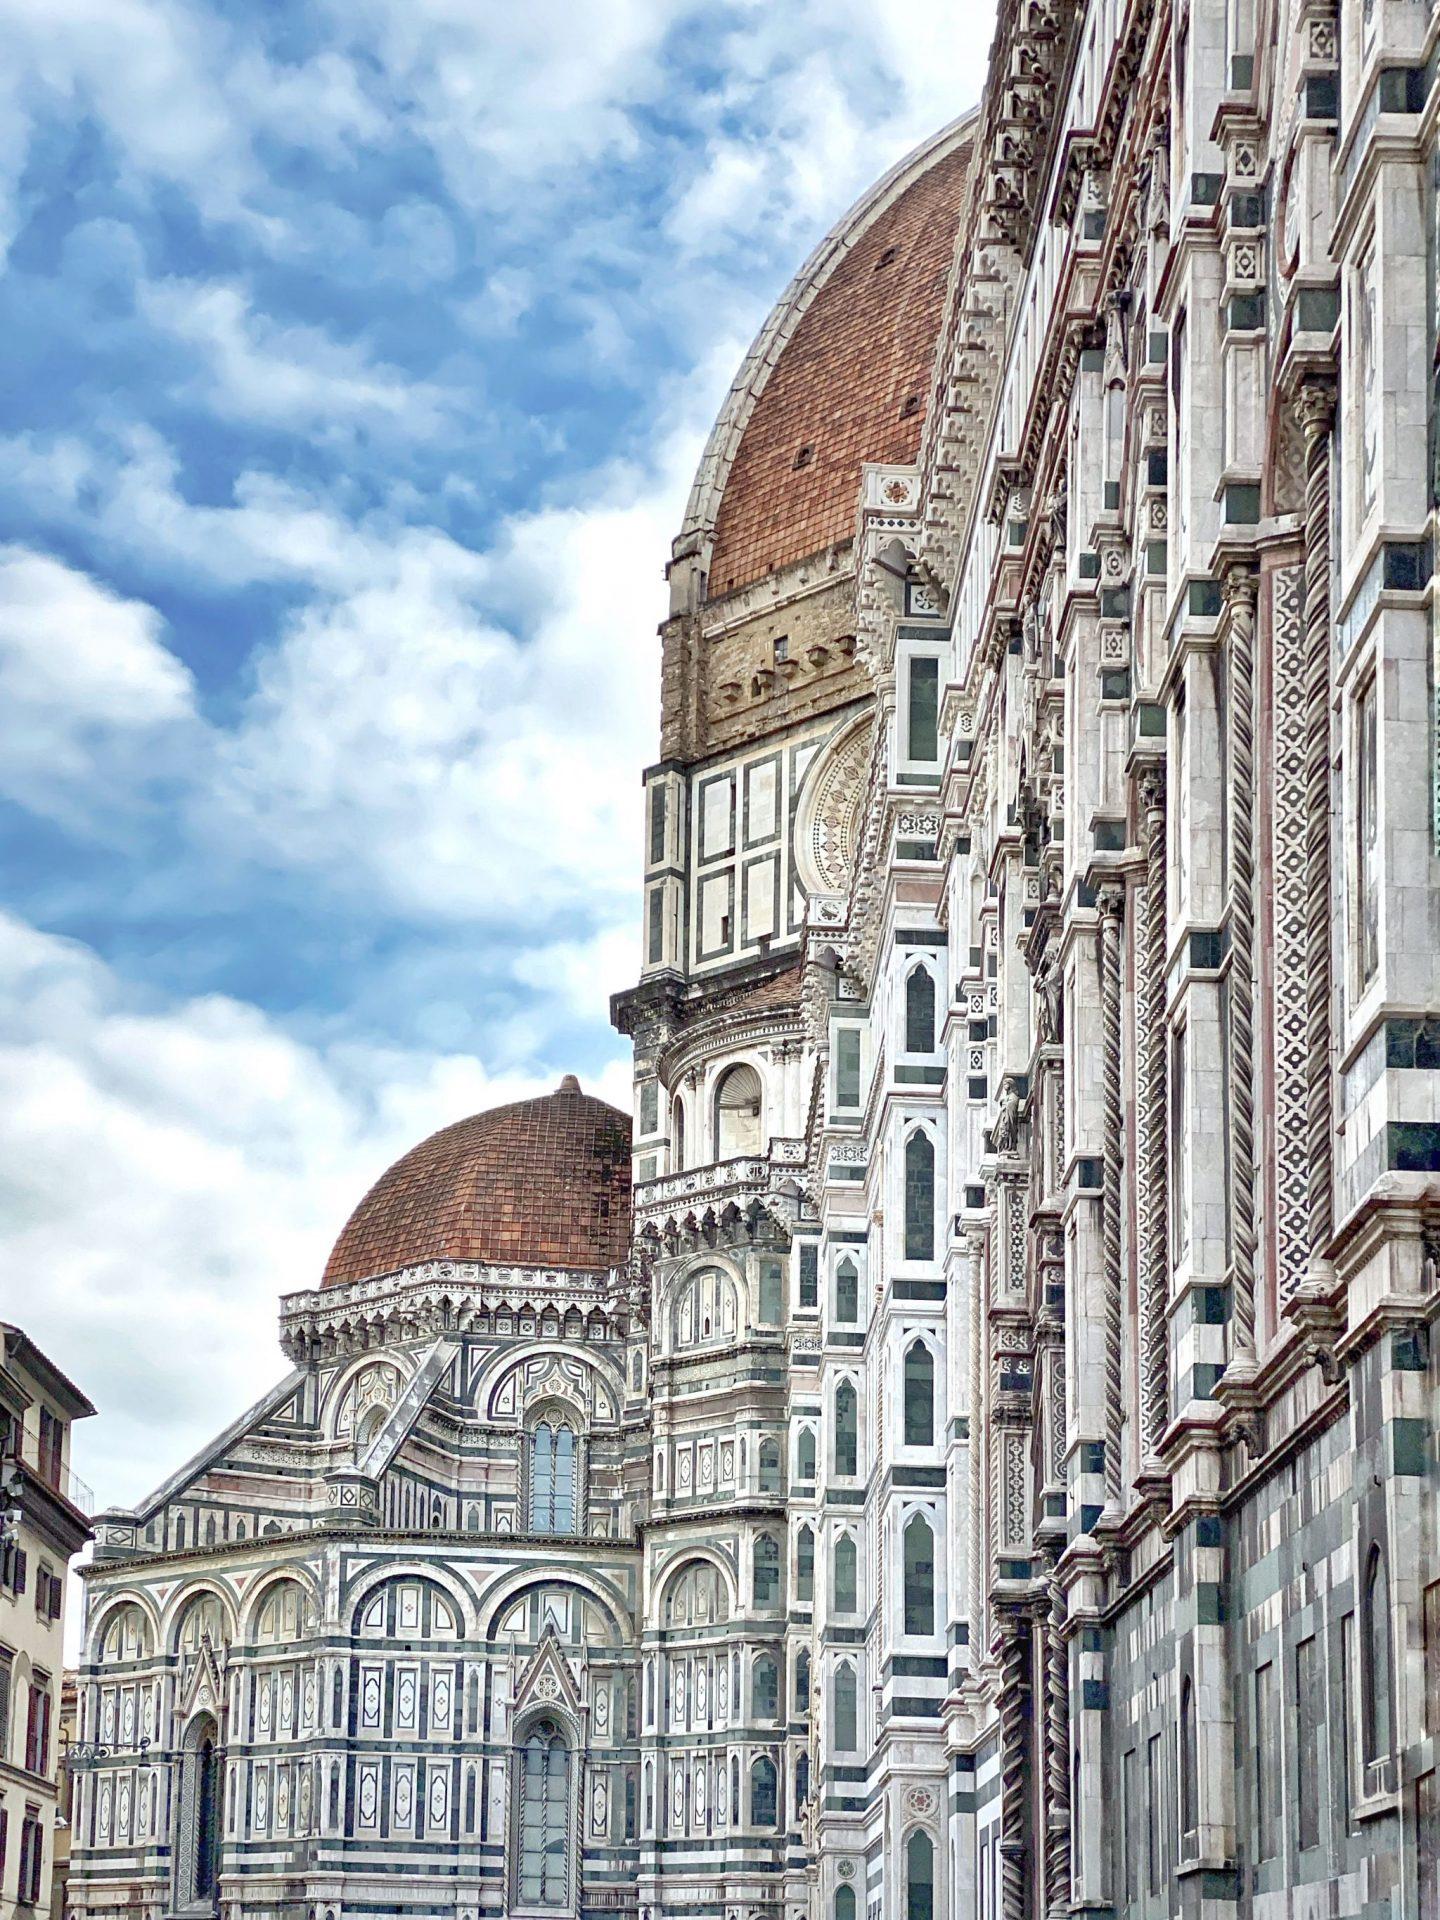 Baptistery of St. John, Florence